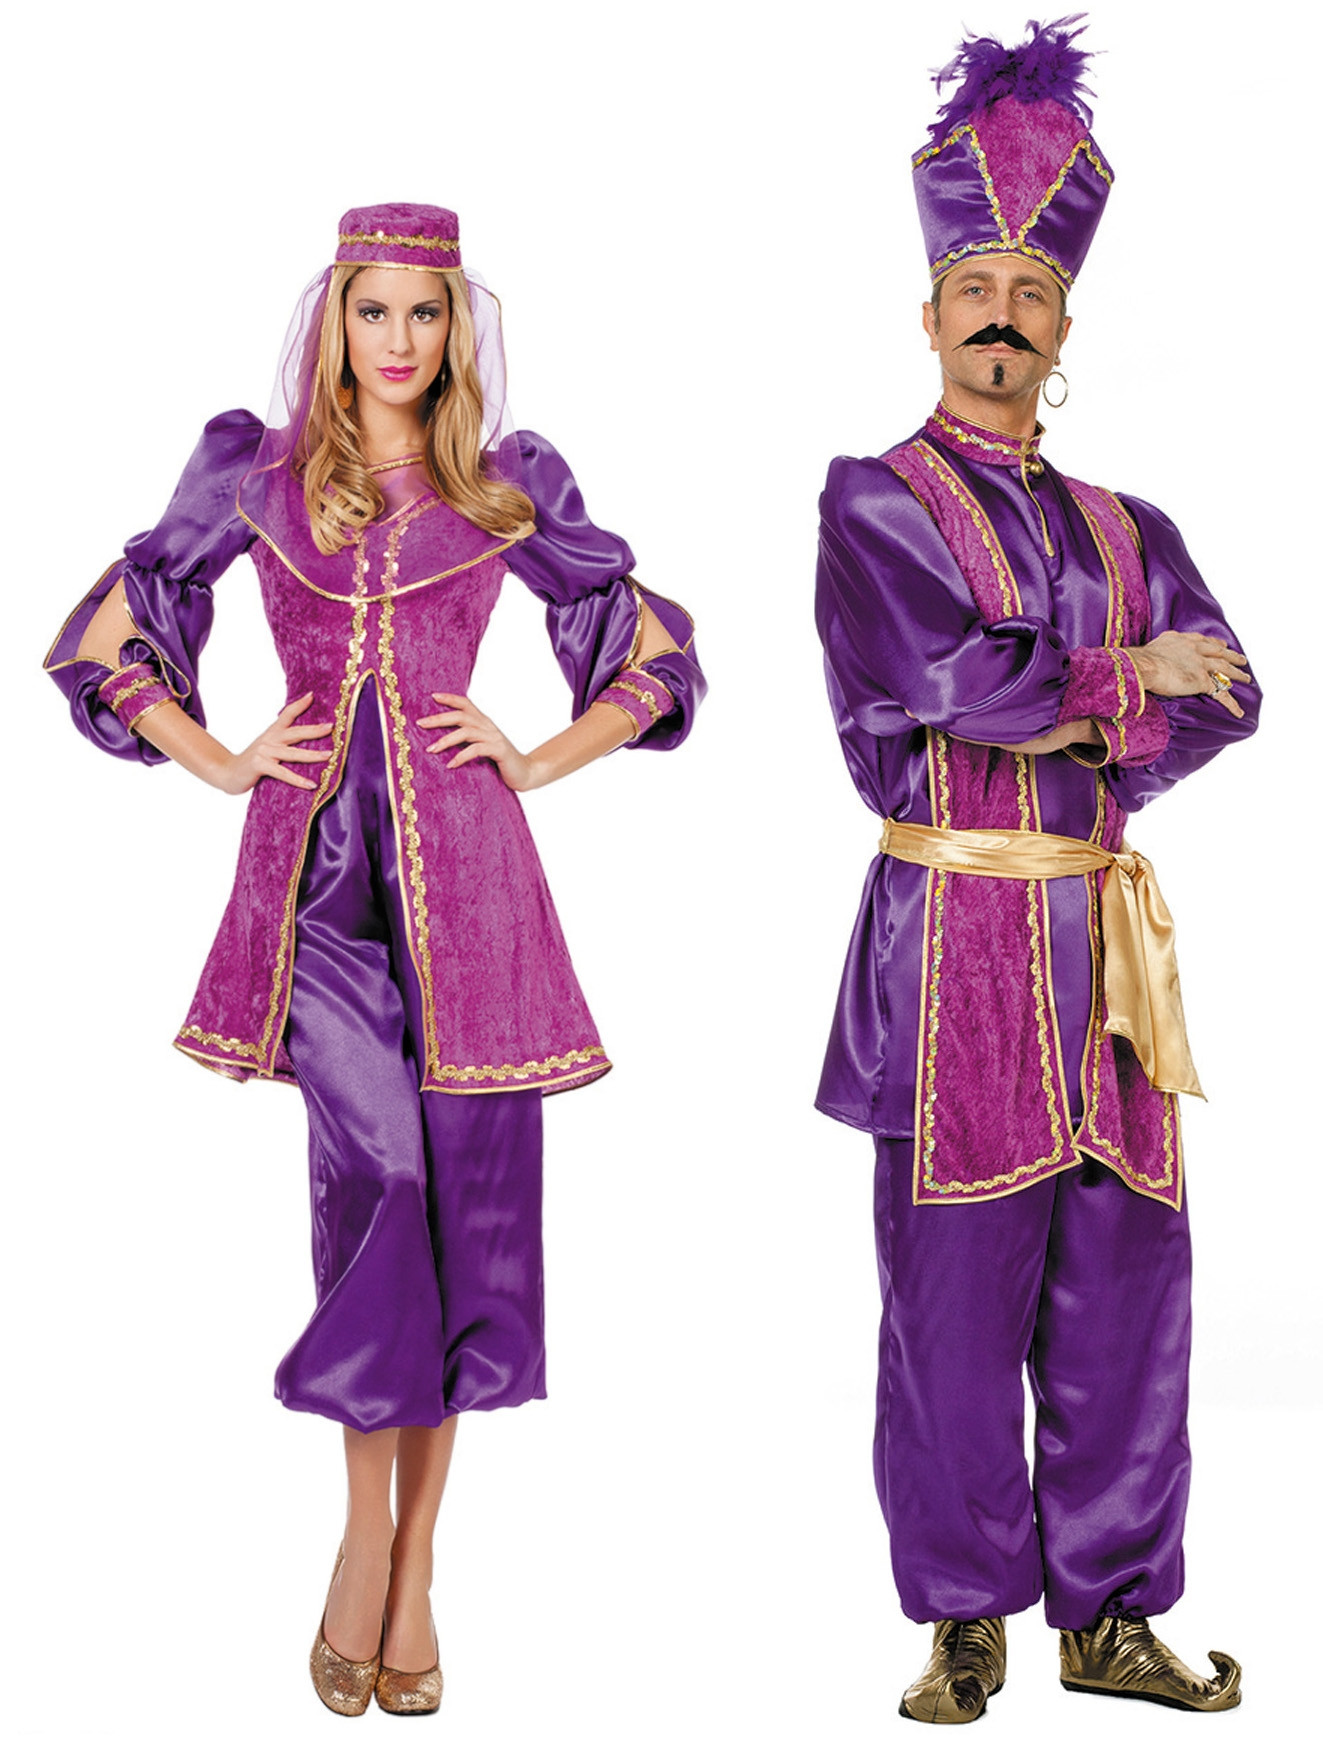 Damen partner kostüme Top 10